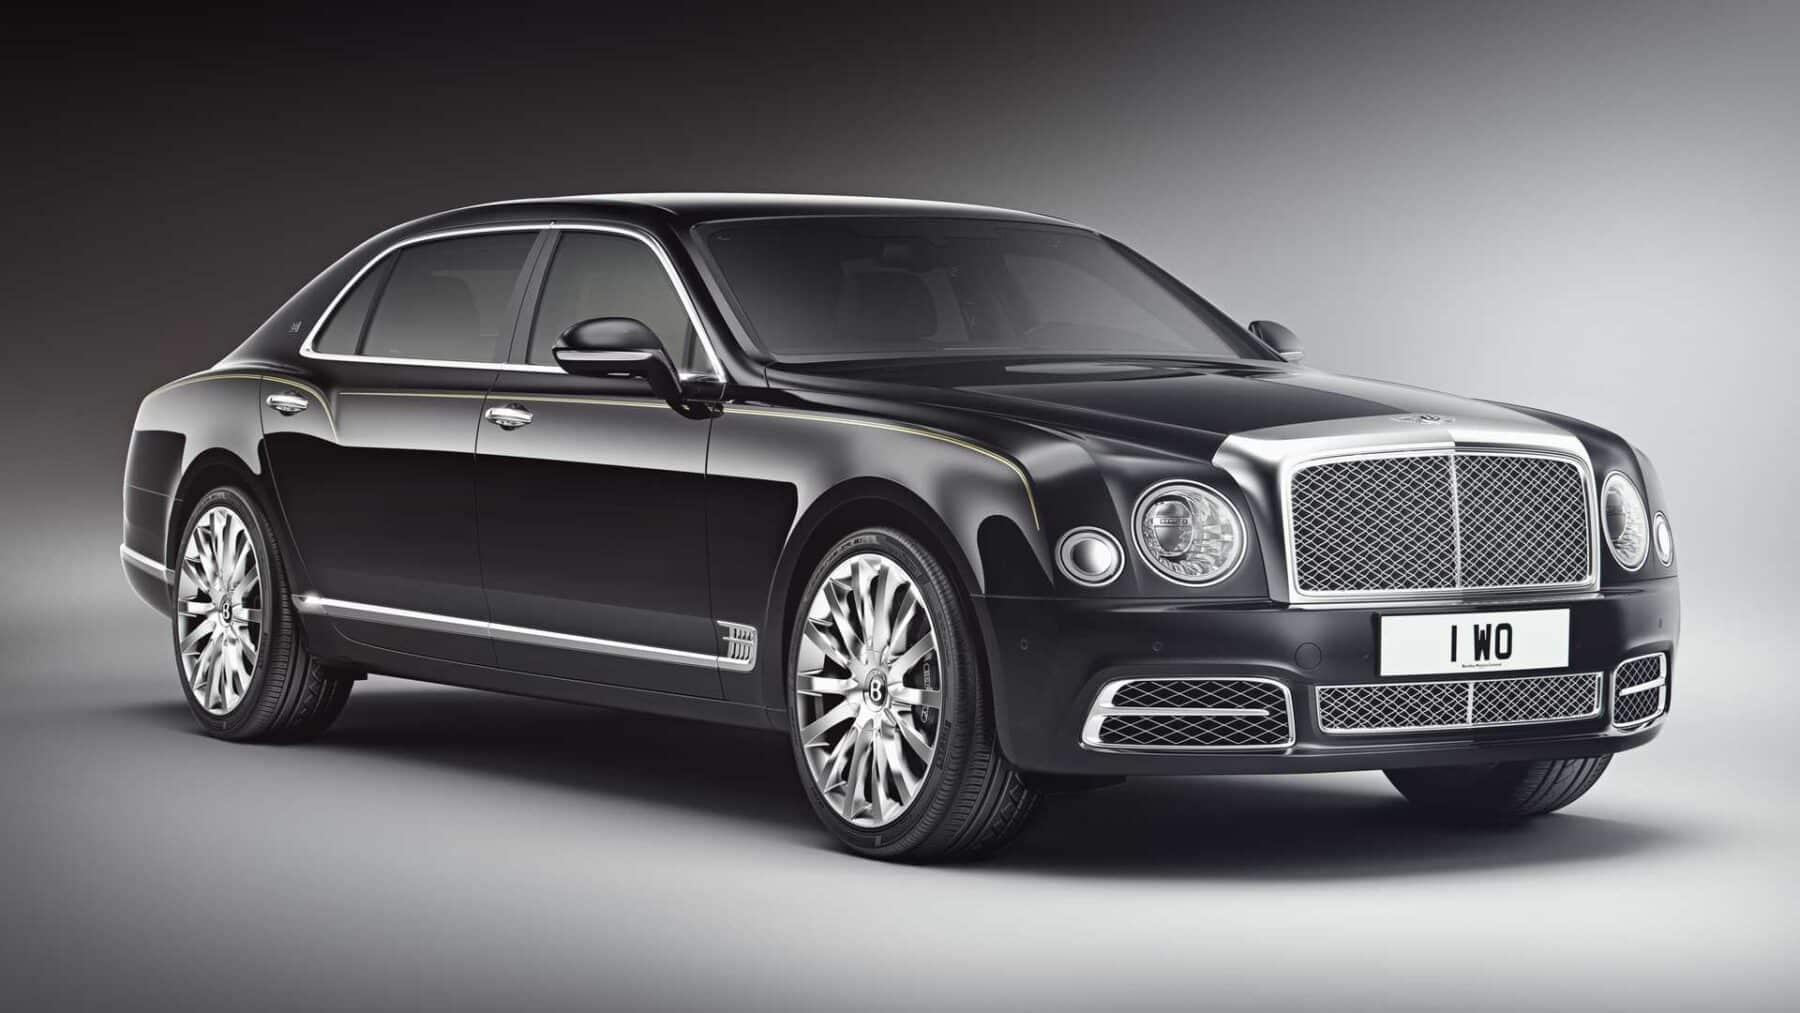 Bentley Mulsanne Extended Wheelbase Limited Edition 2020 Opulencia Para El Mercado Chino